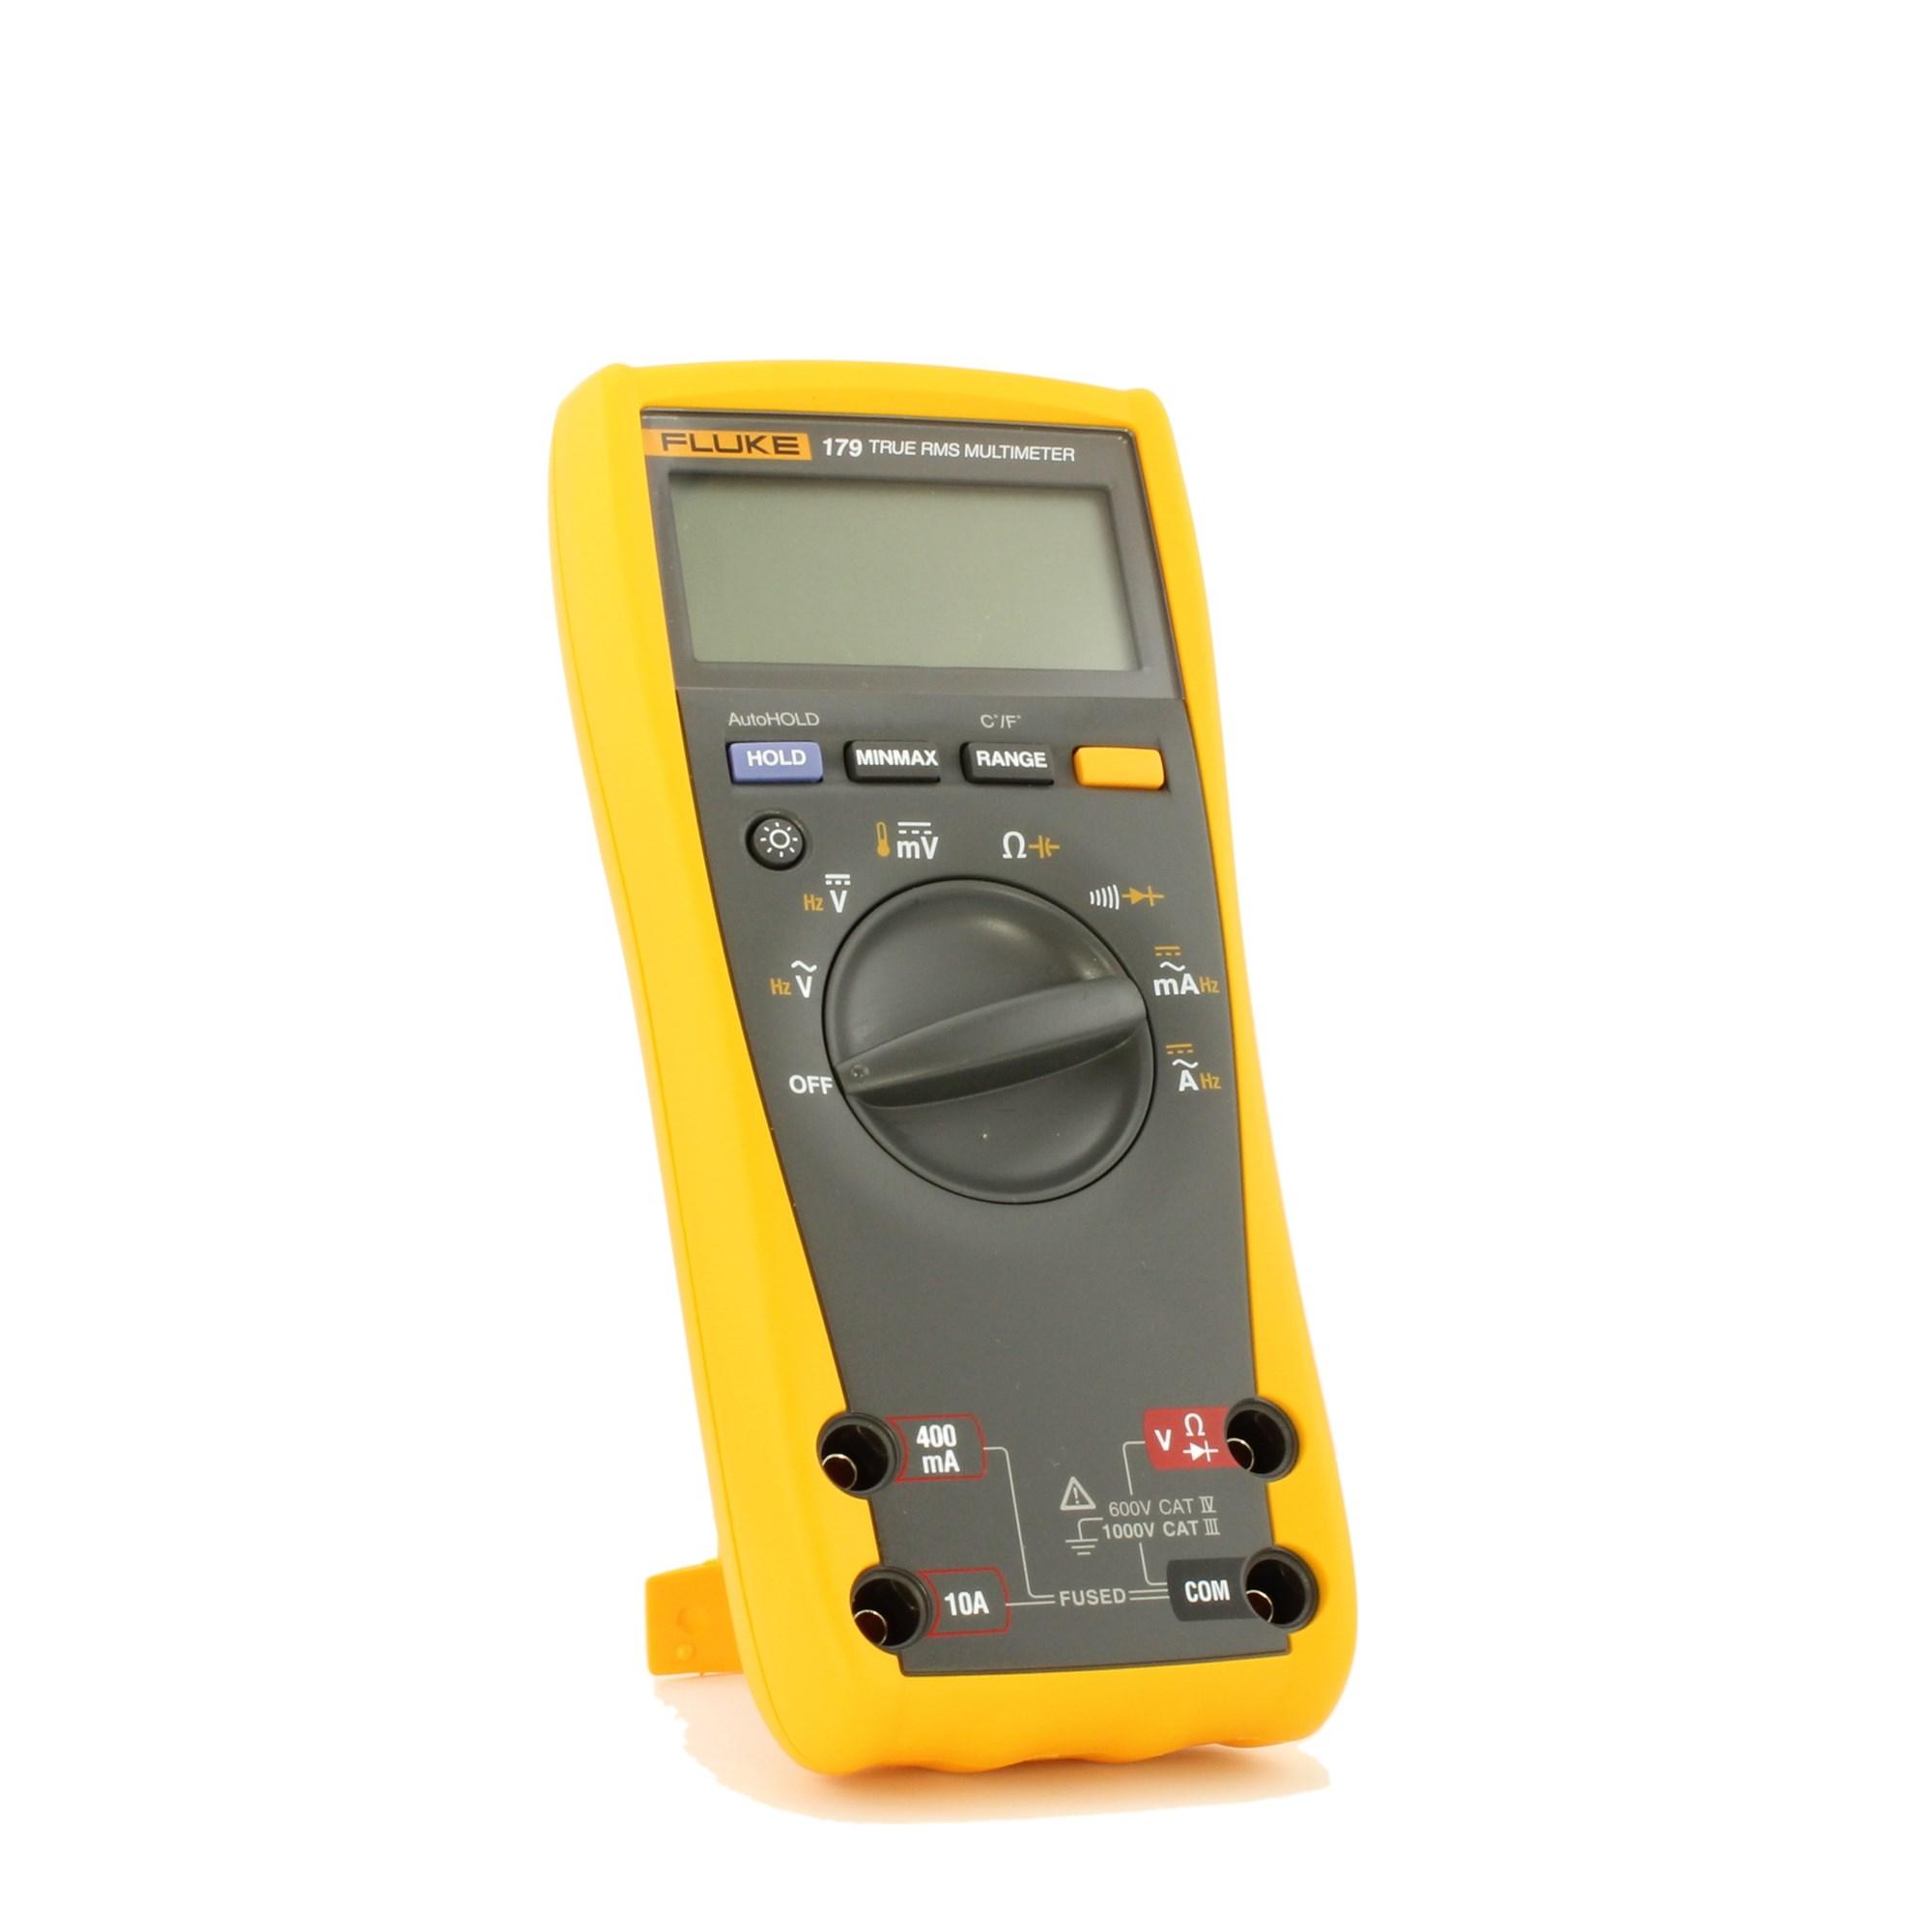 Fluke 179 Digital Multimeter 6000 Count Dmm With Backlight Santronics Ac Dc Voltage Detectors Quickly Test For Energized Circuits Temperature Measurement